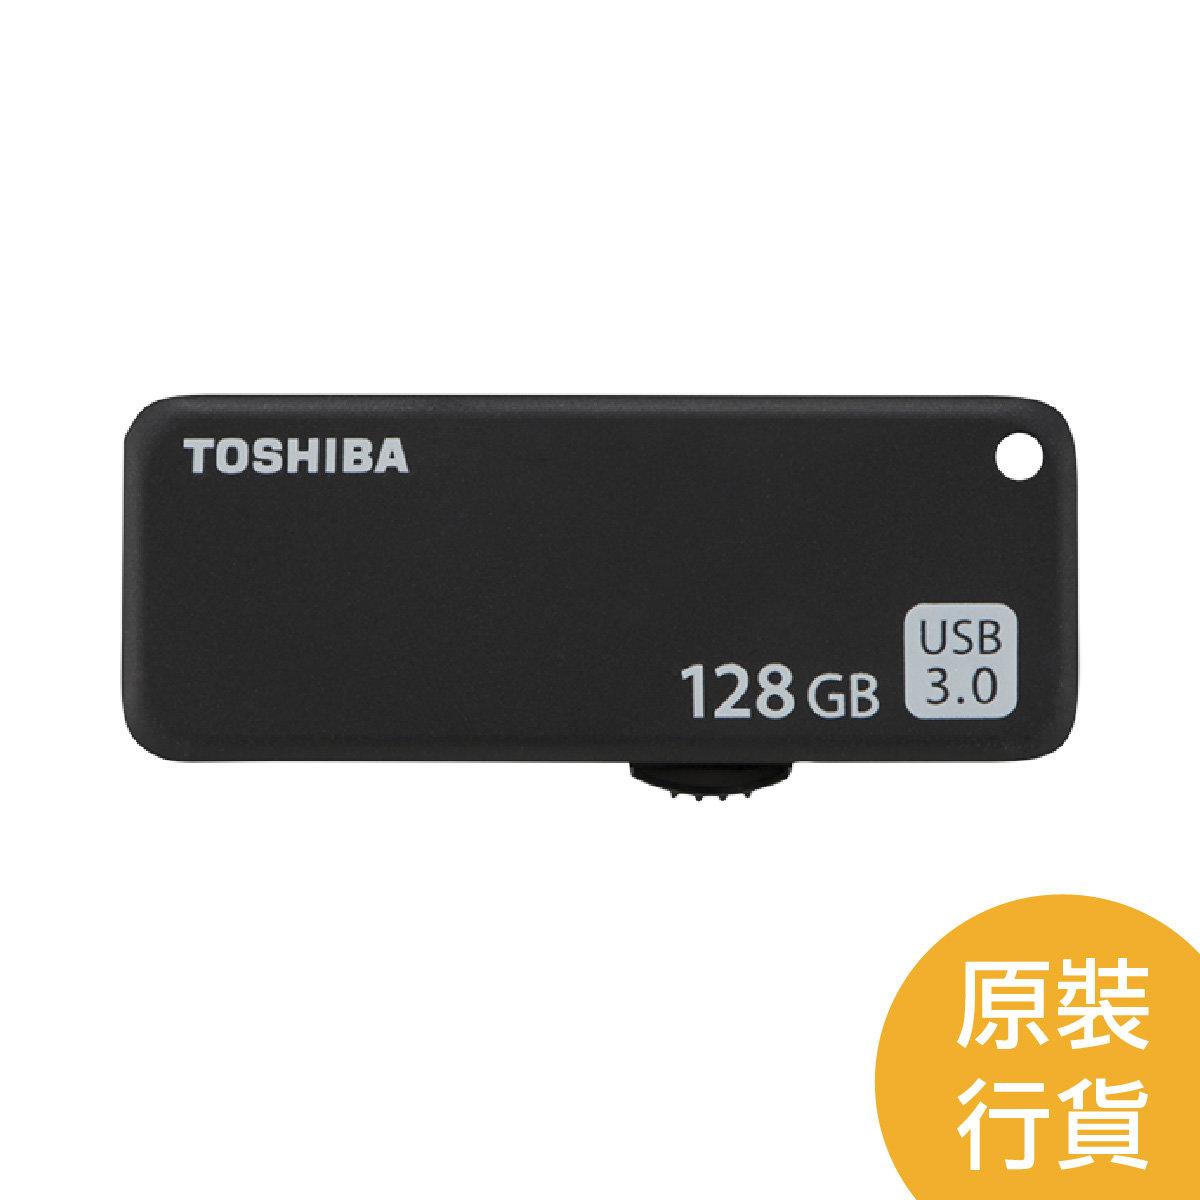 128GB TransMemory™ U365 USB3.0 Memory Stick Black-Slide